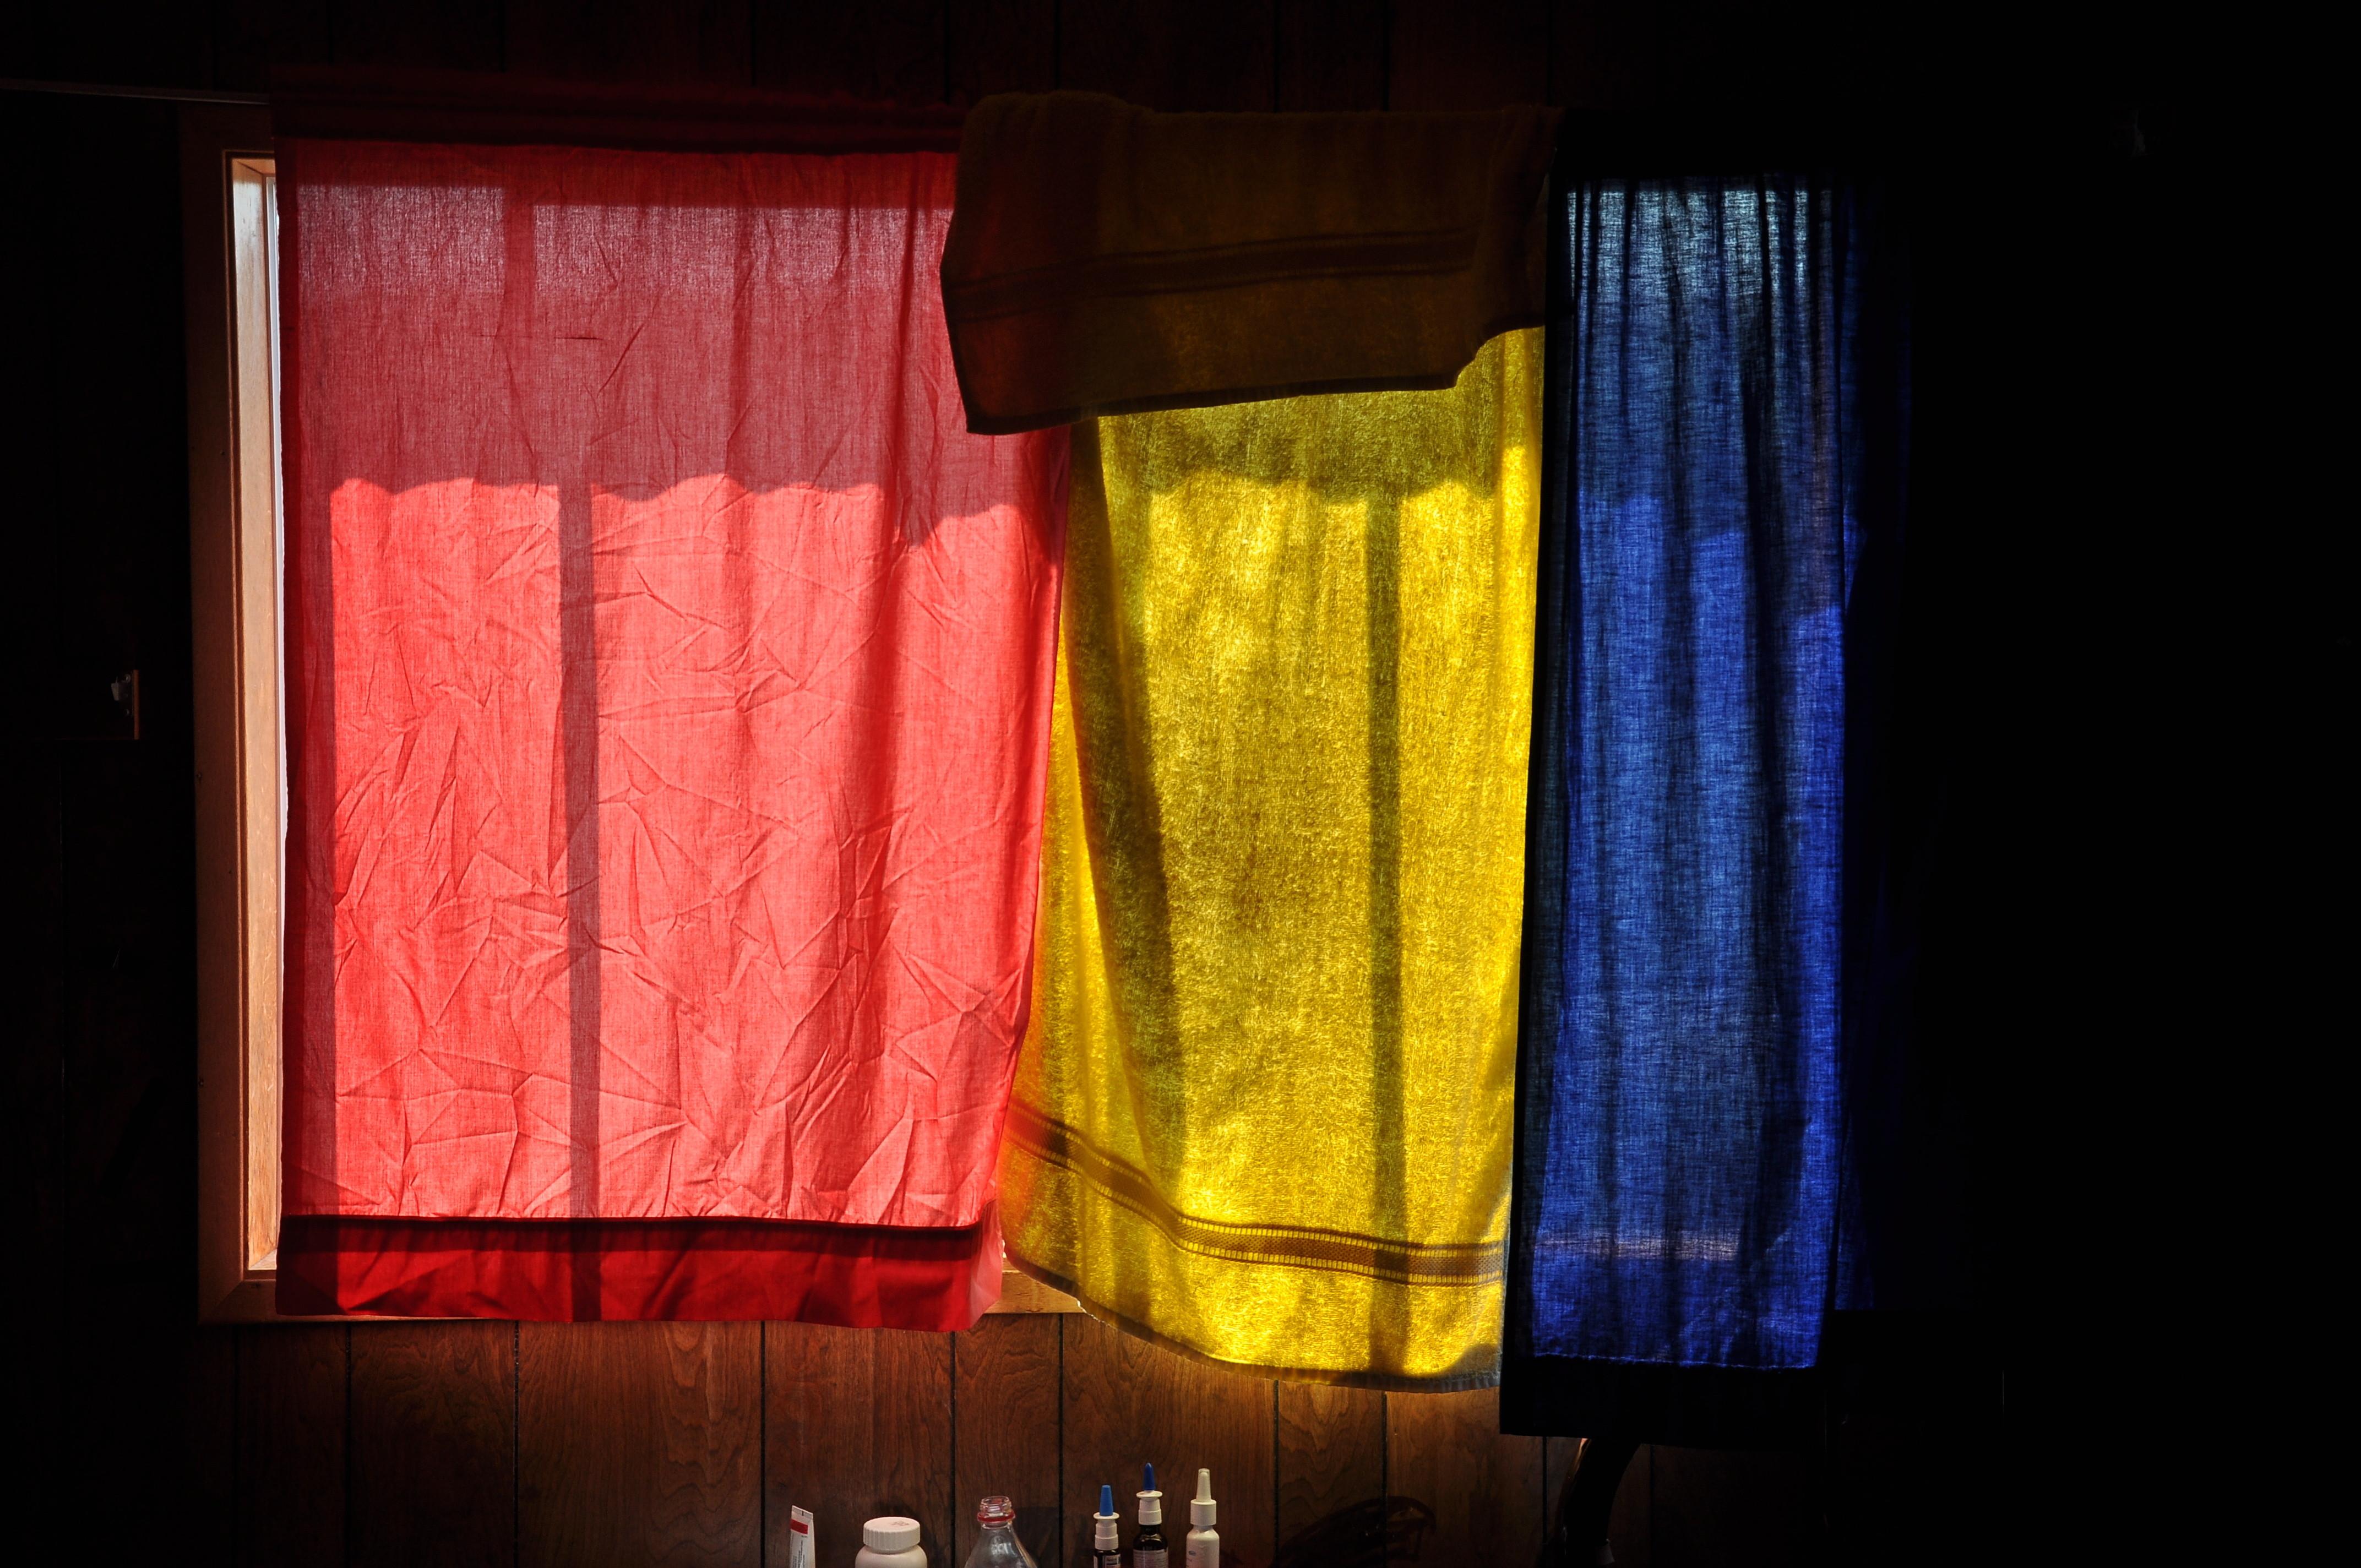 curtain towel window